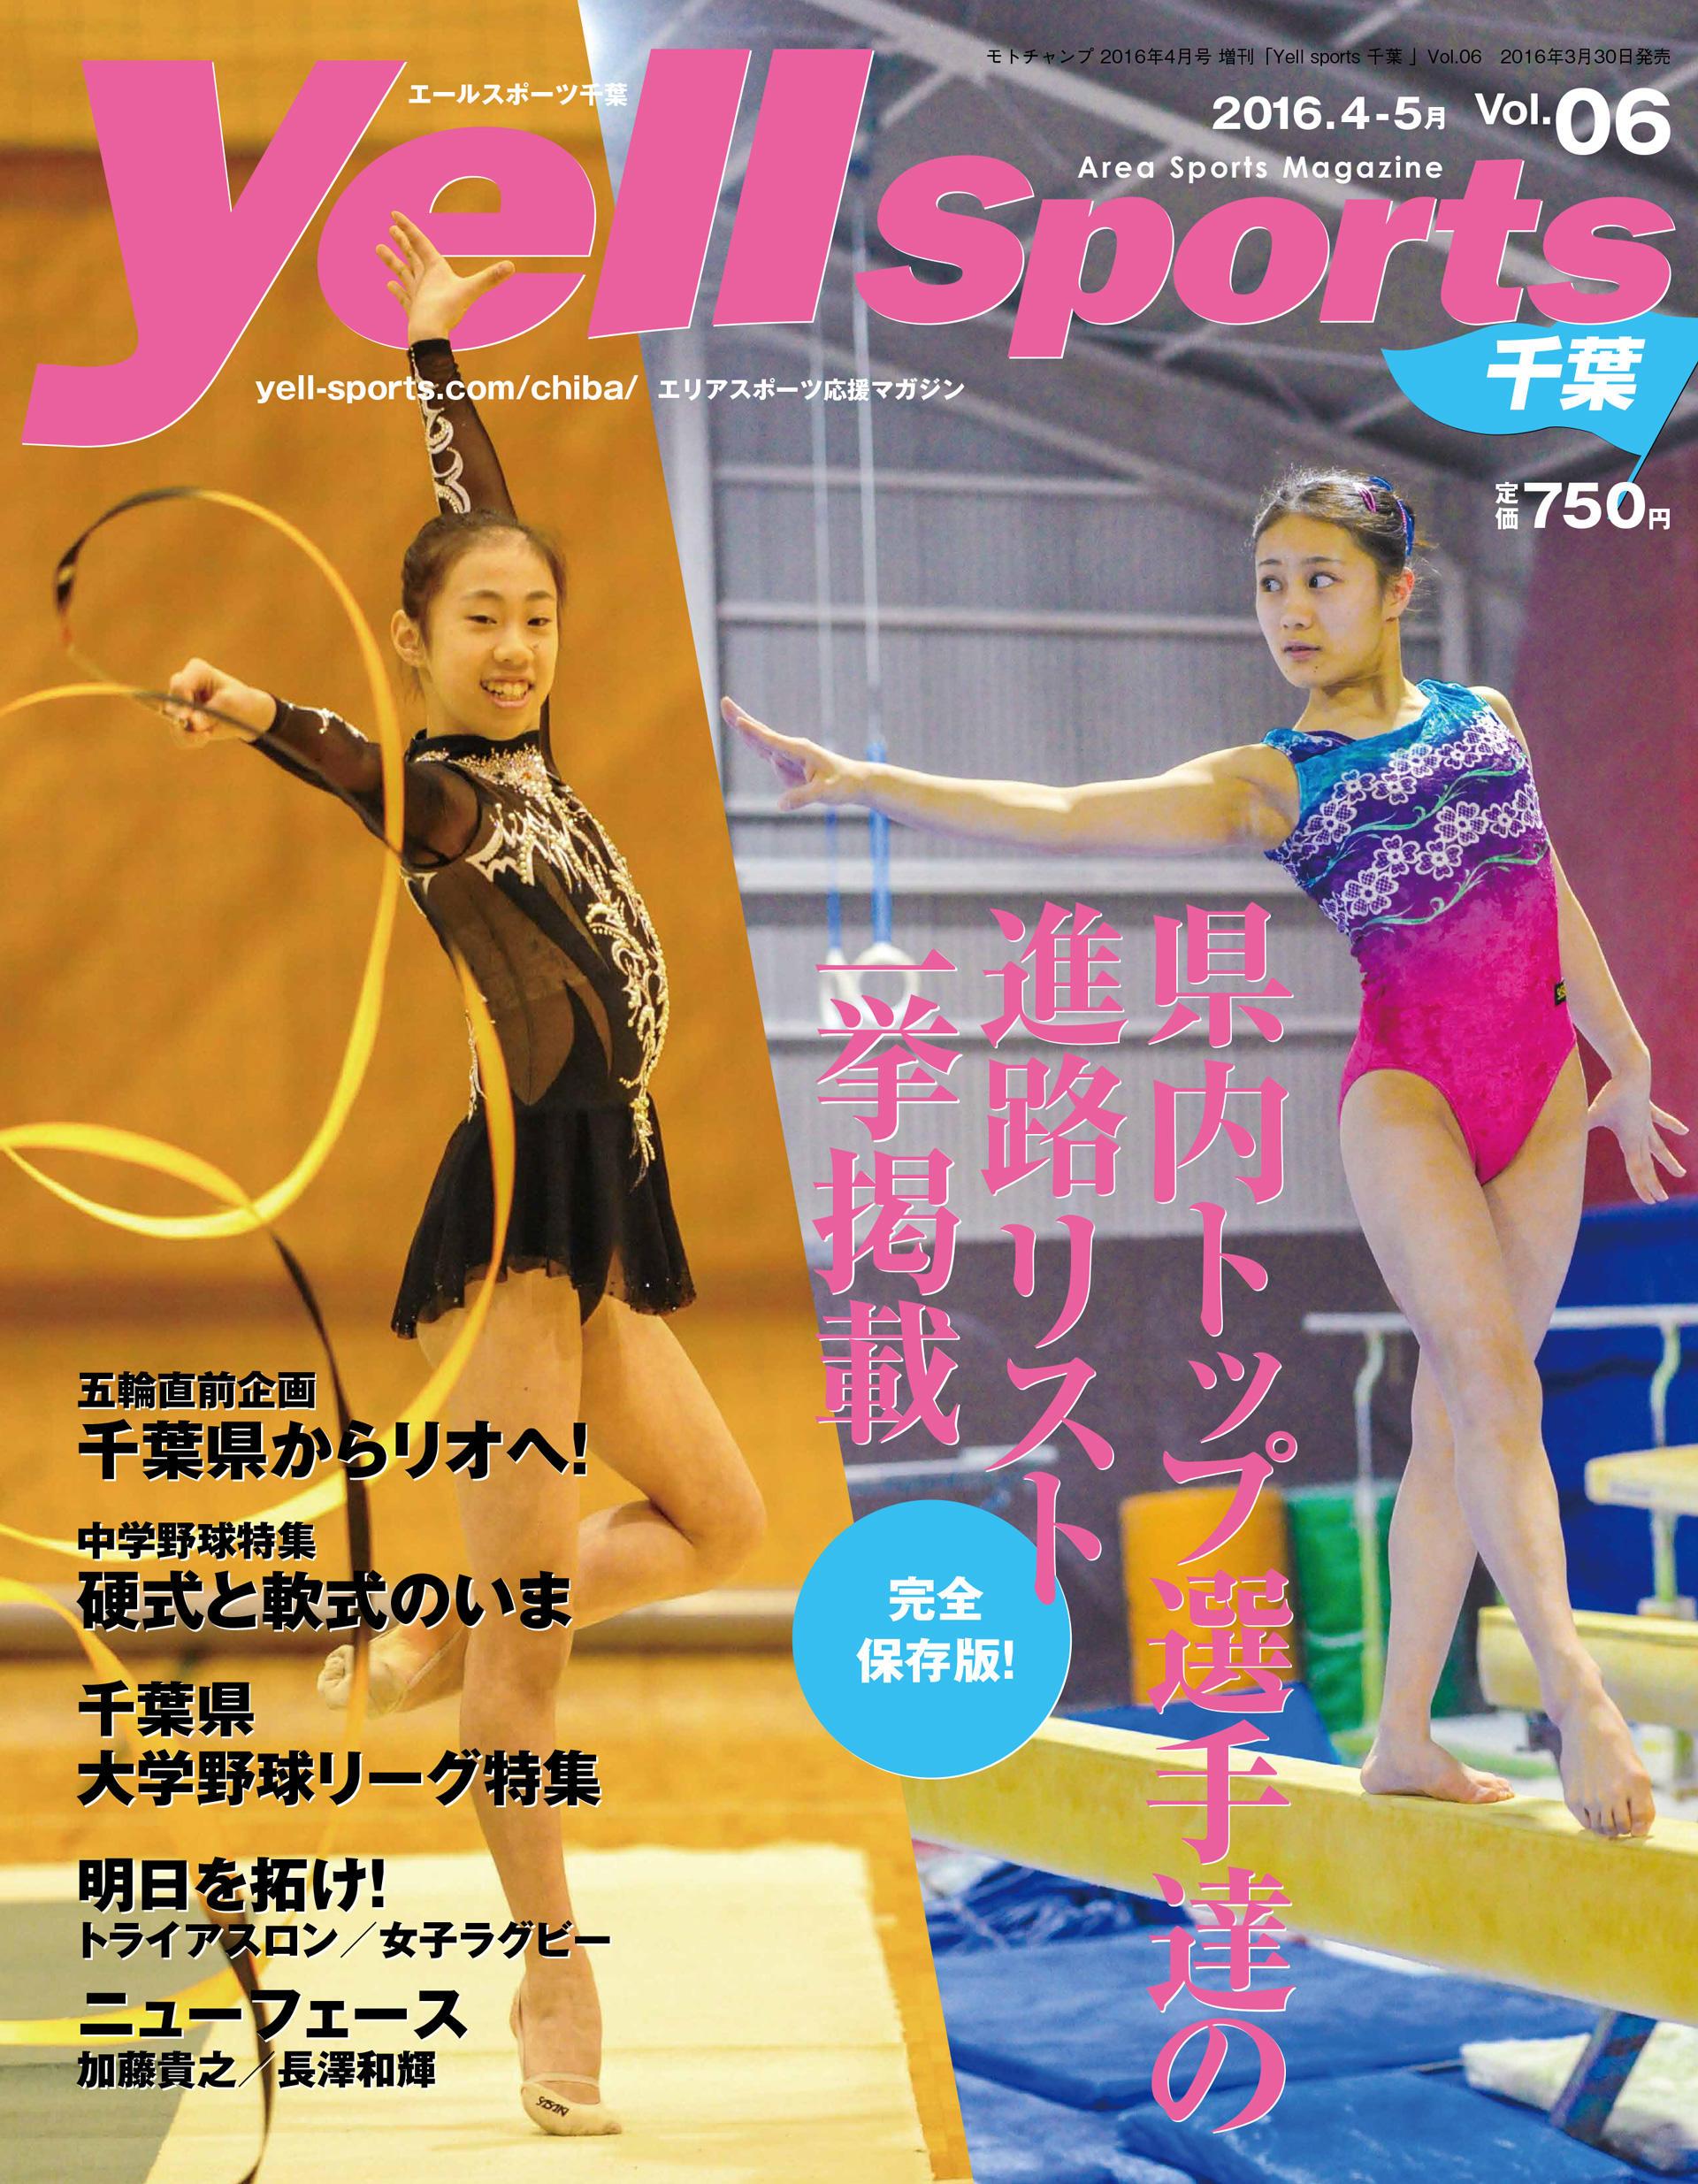 http://yell-sports.com/chiba/article/2016/ysc_06_1.jpg